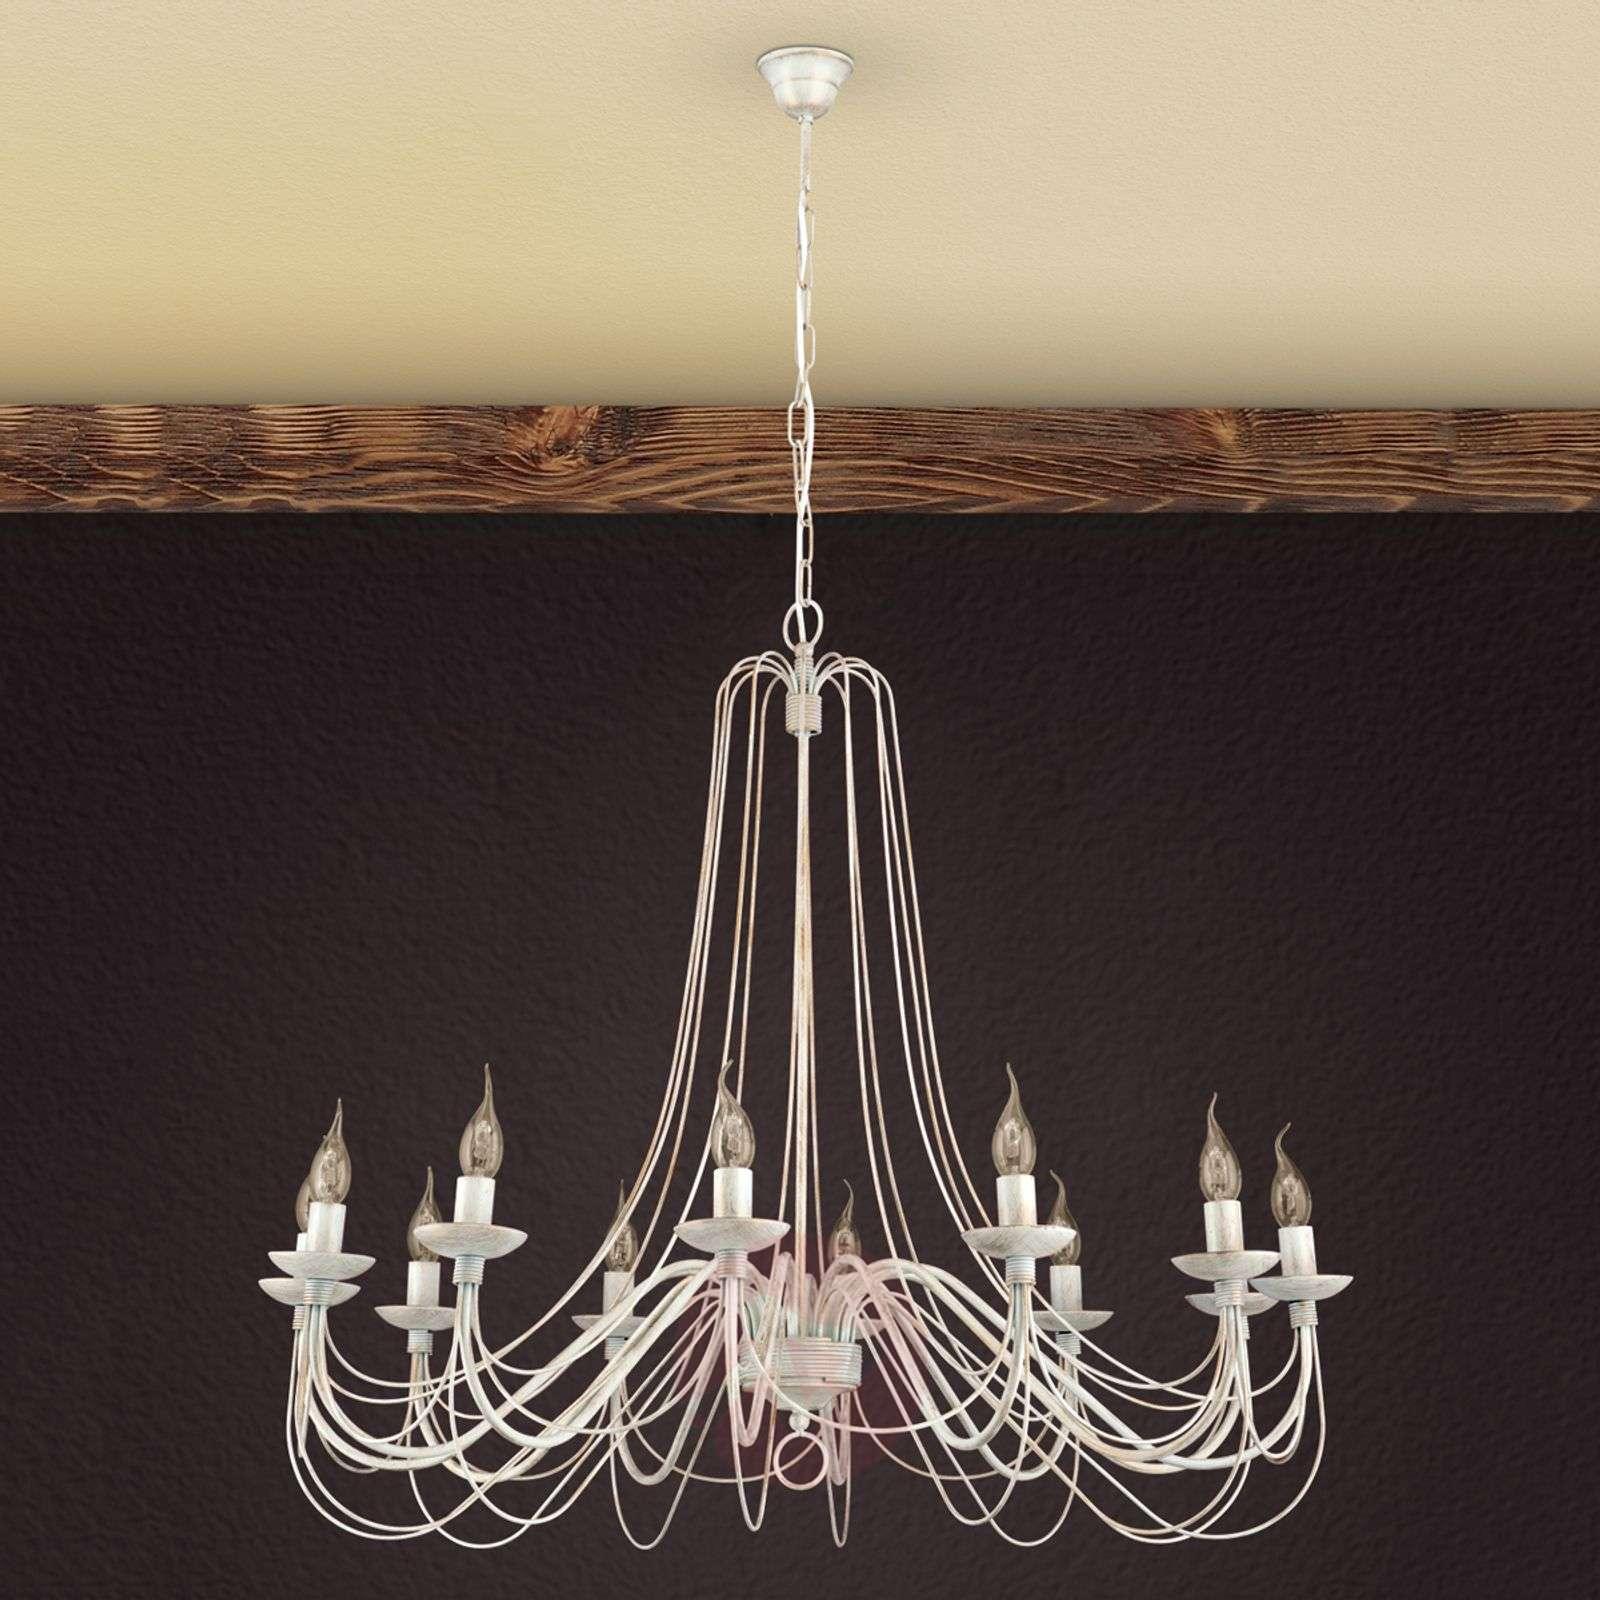 Rustic country style chandelier antonina 12 light lights rustic country style chandelier antonina 12 light 7255076 01 aloadofball Images